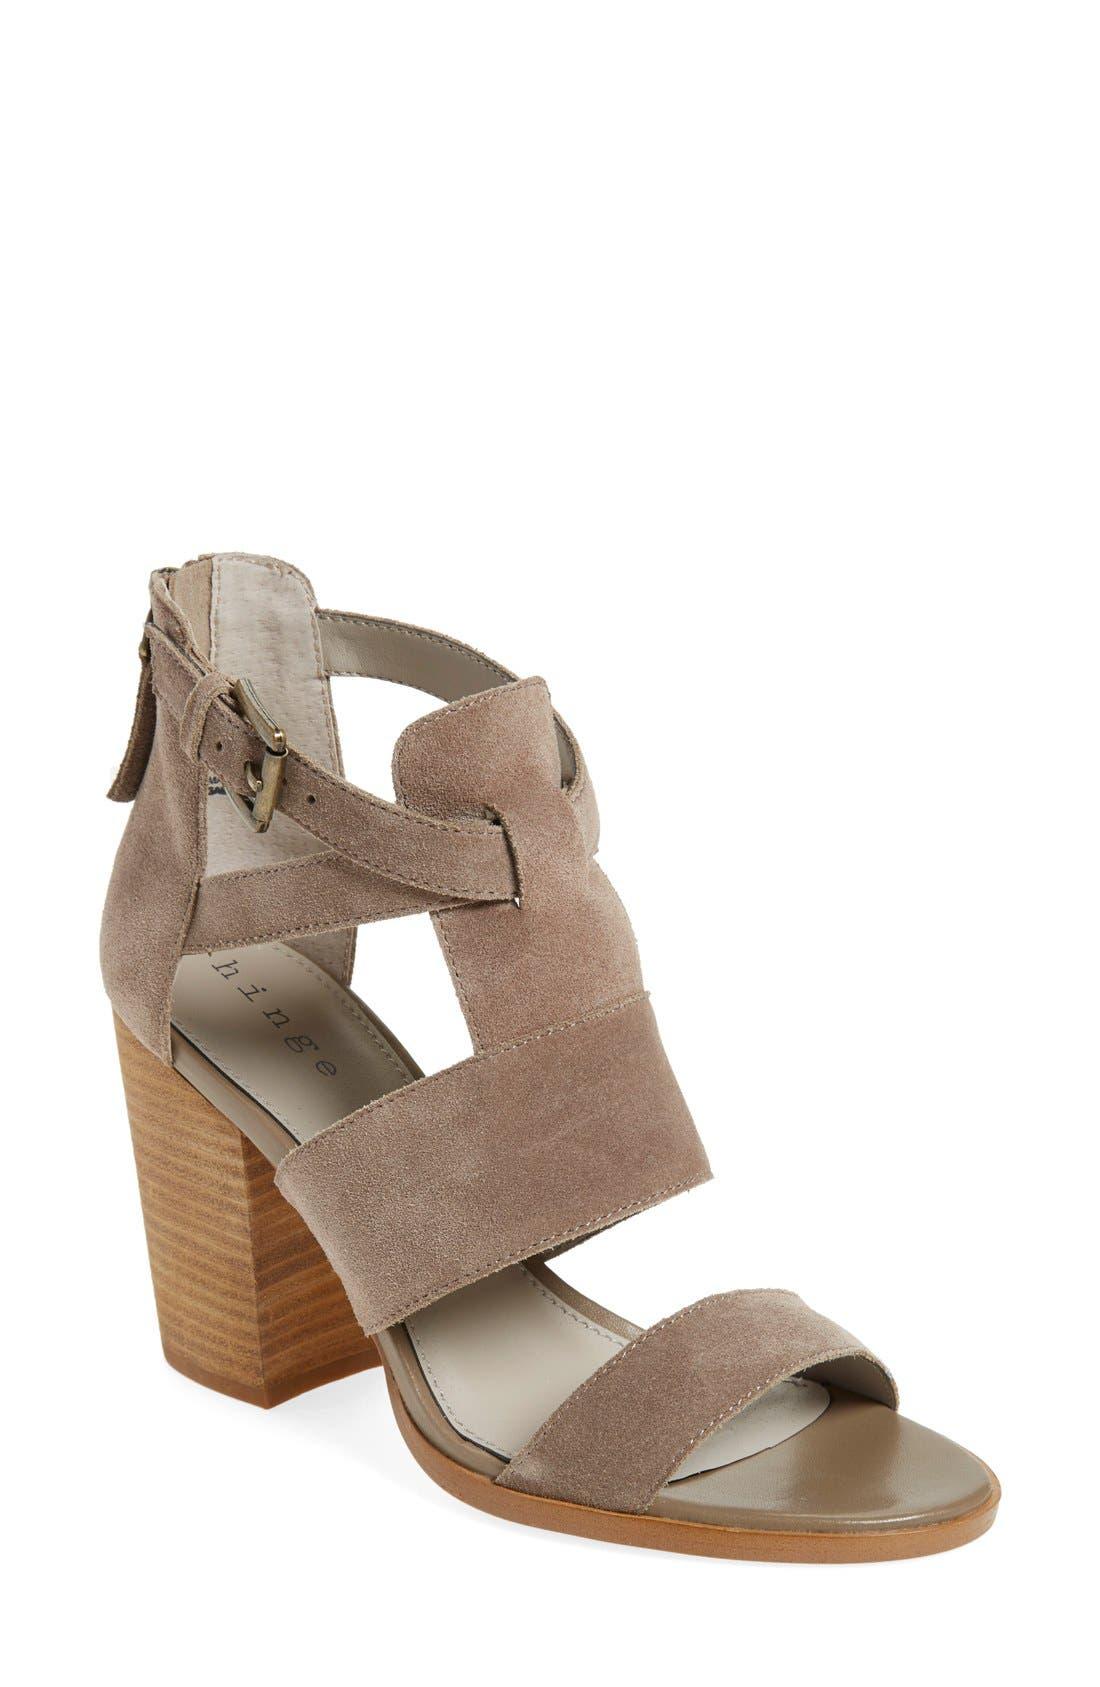 'Cora' Block Heel Sandal,                             Main thumbnail 1, color,                             Taupe Suede